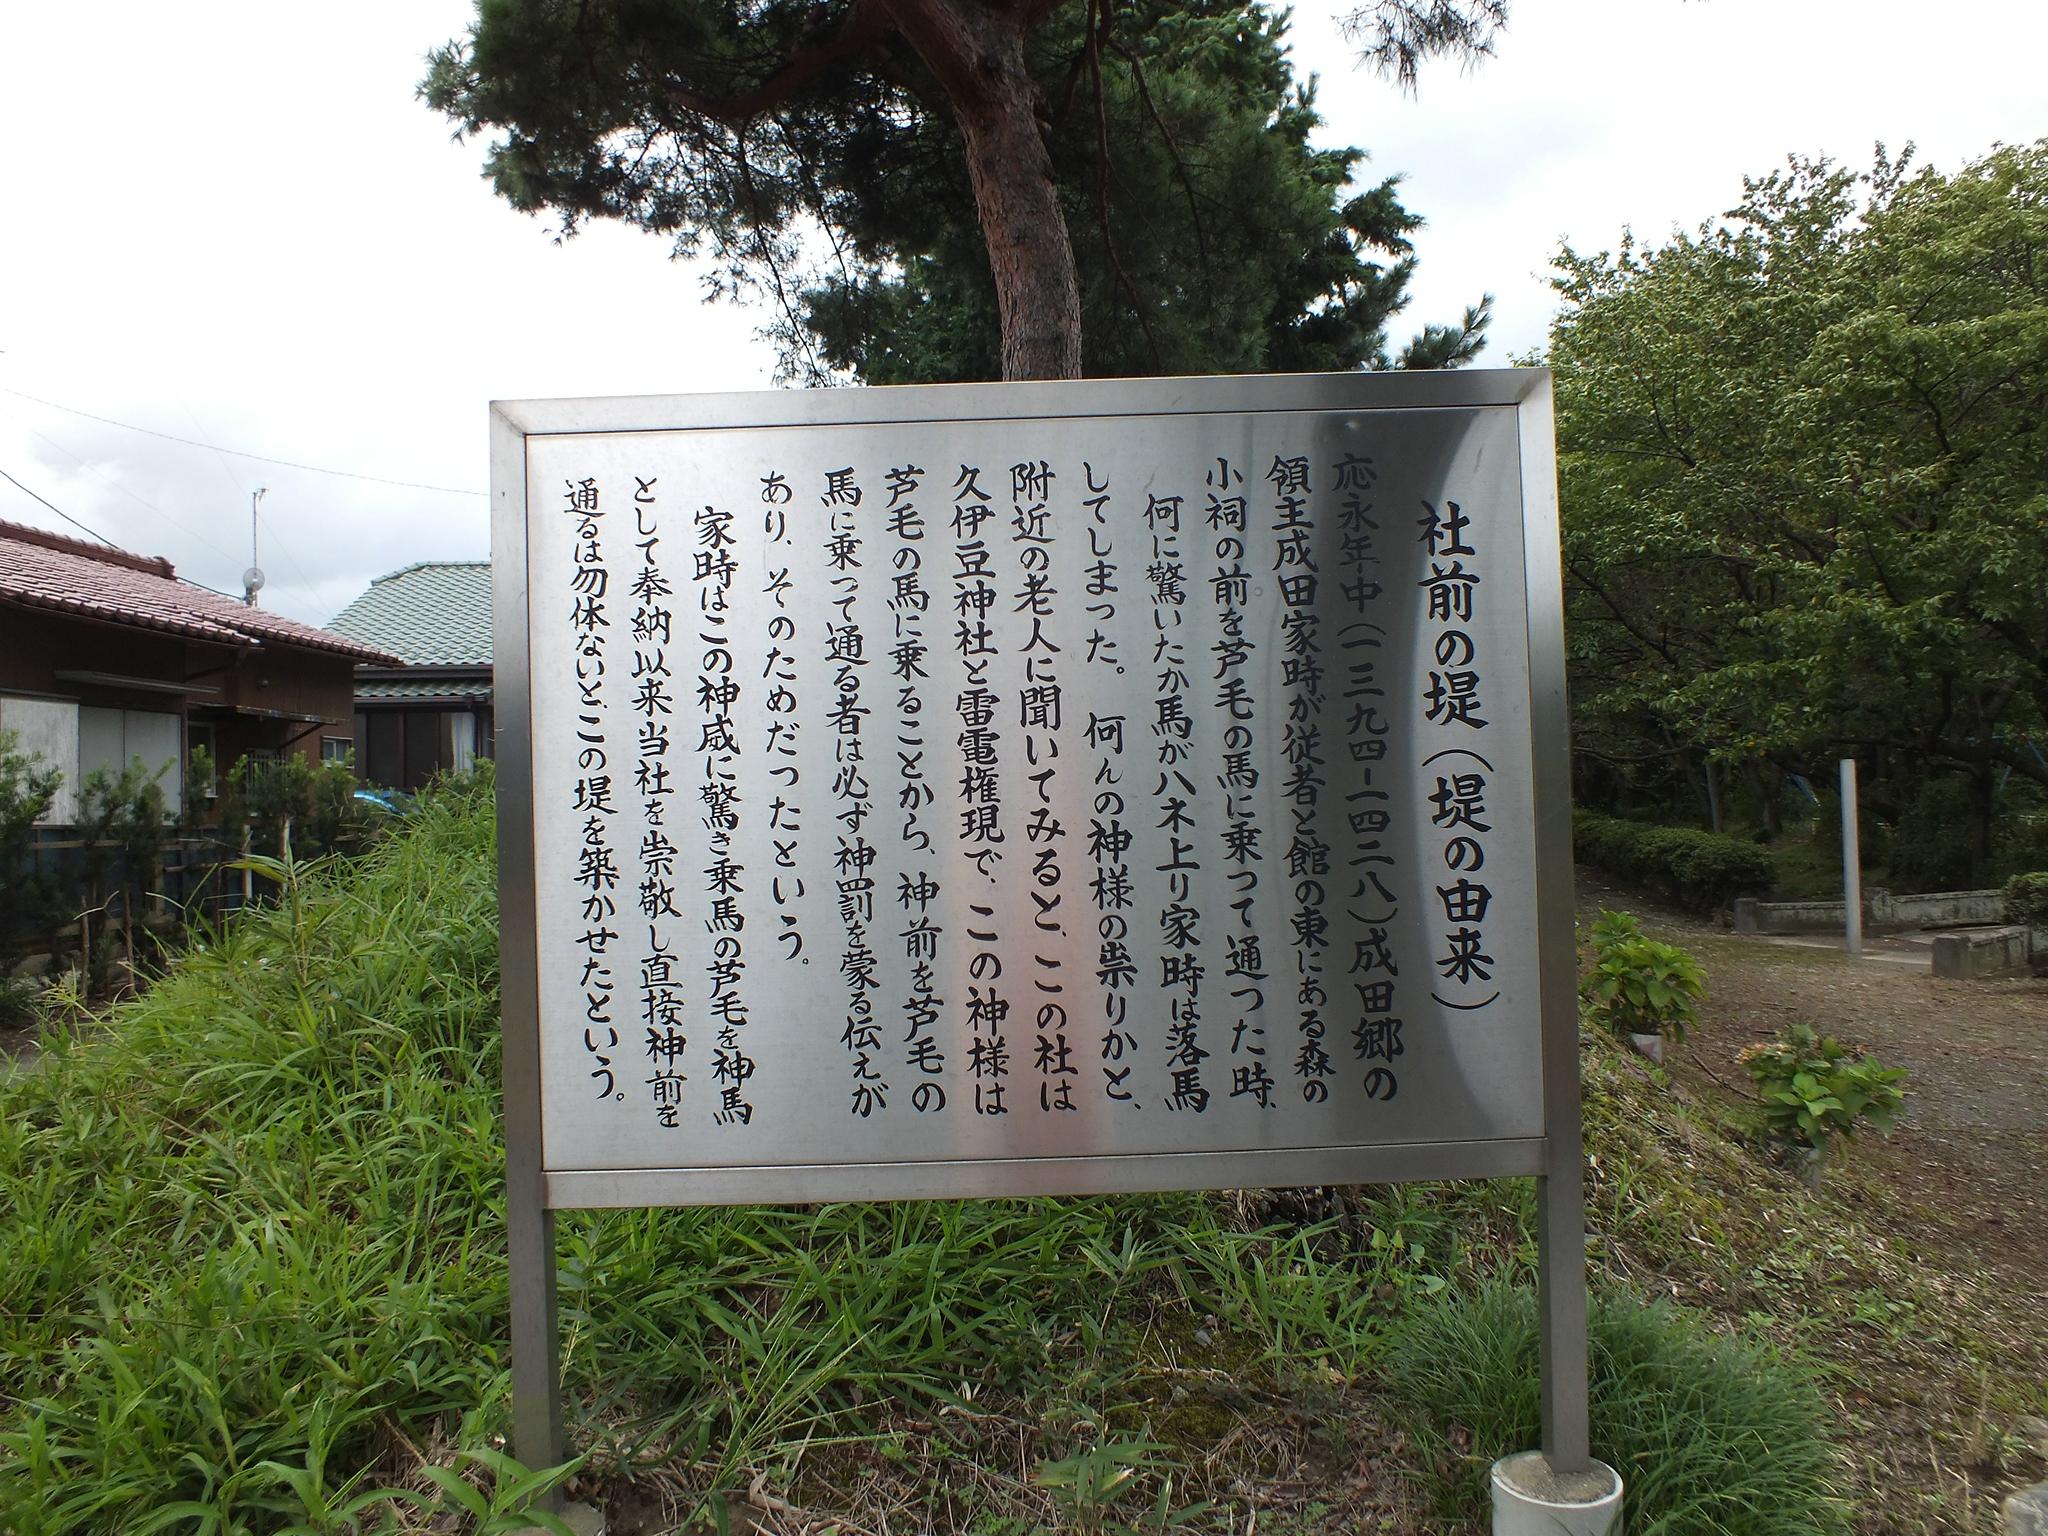 雷電神社前の土塁